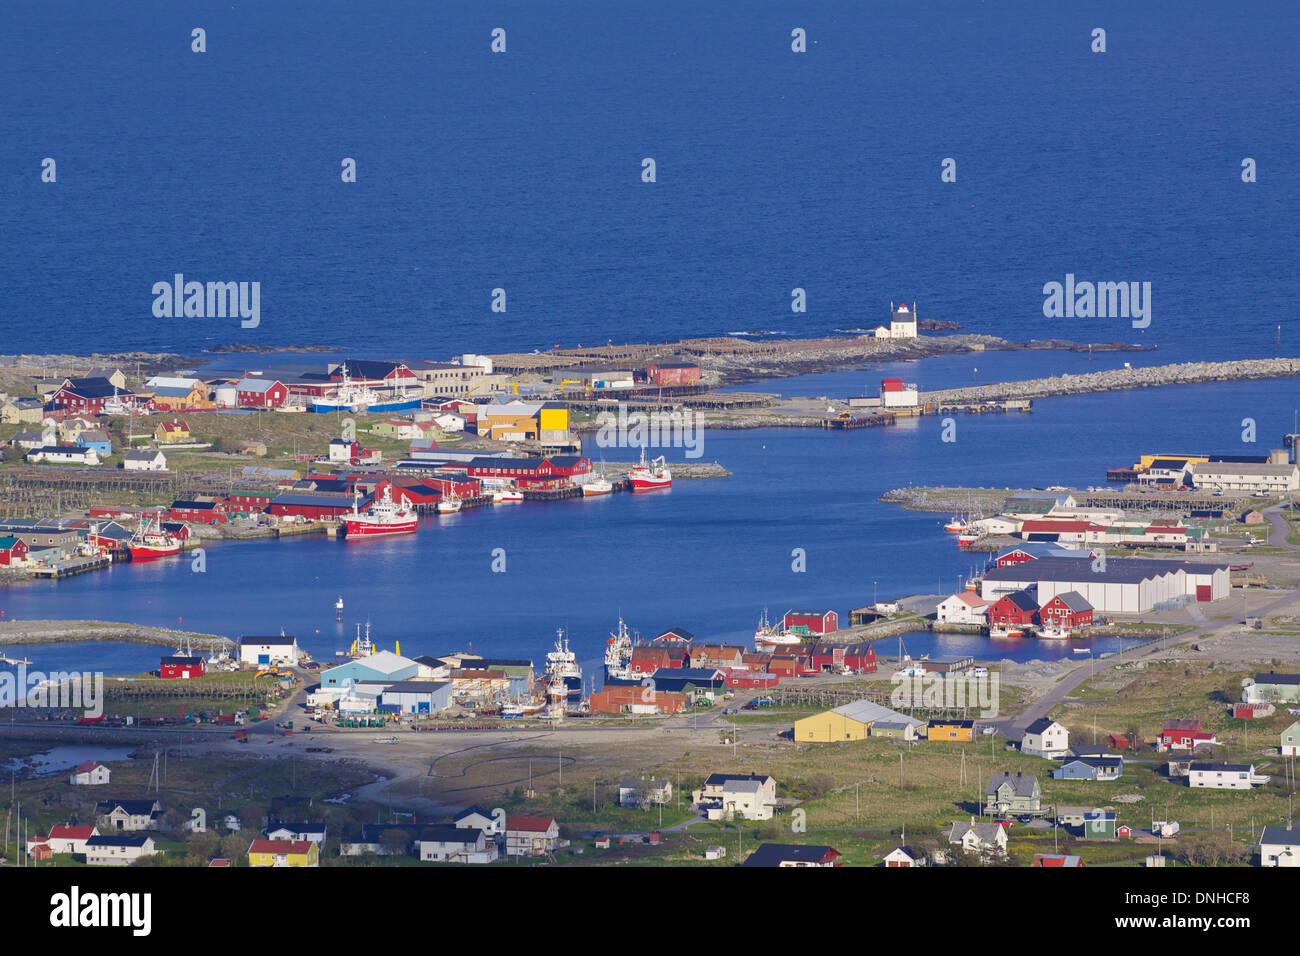 Industrial fishing harbour in town of Sorland on Lofoten islands in Norway - Stock Image